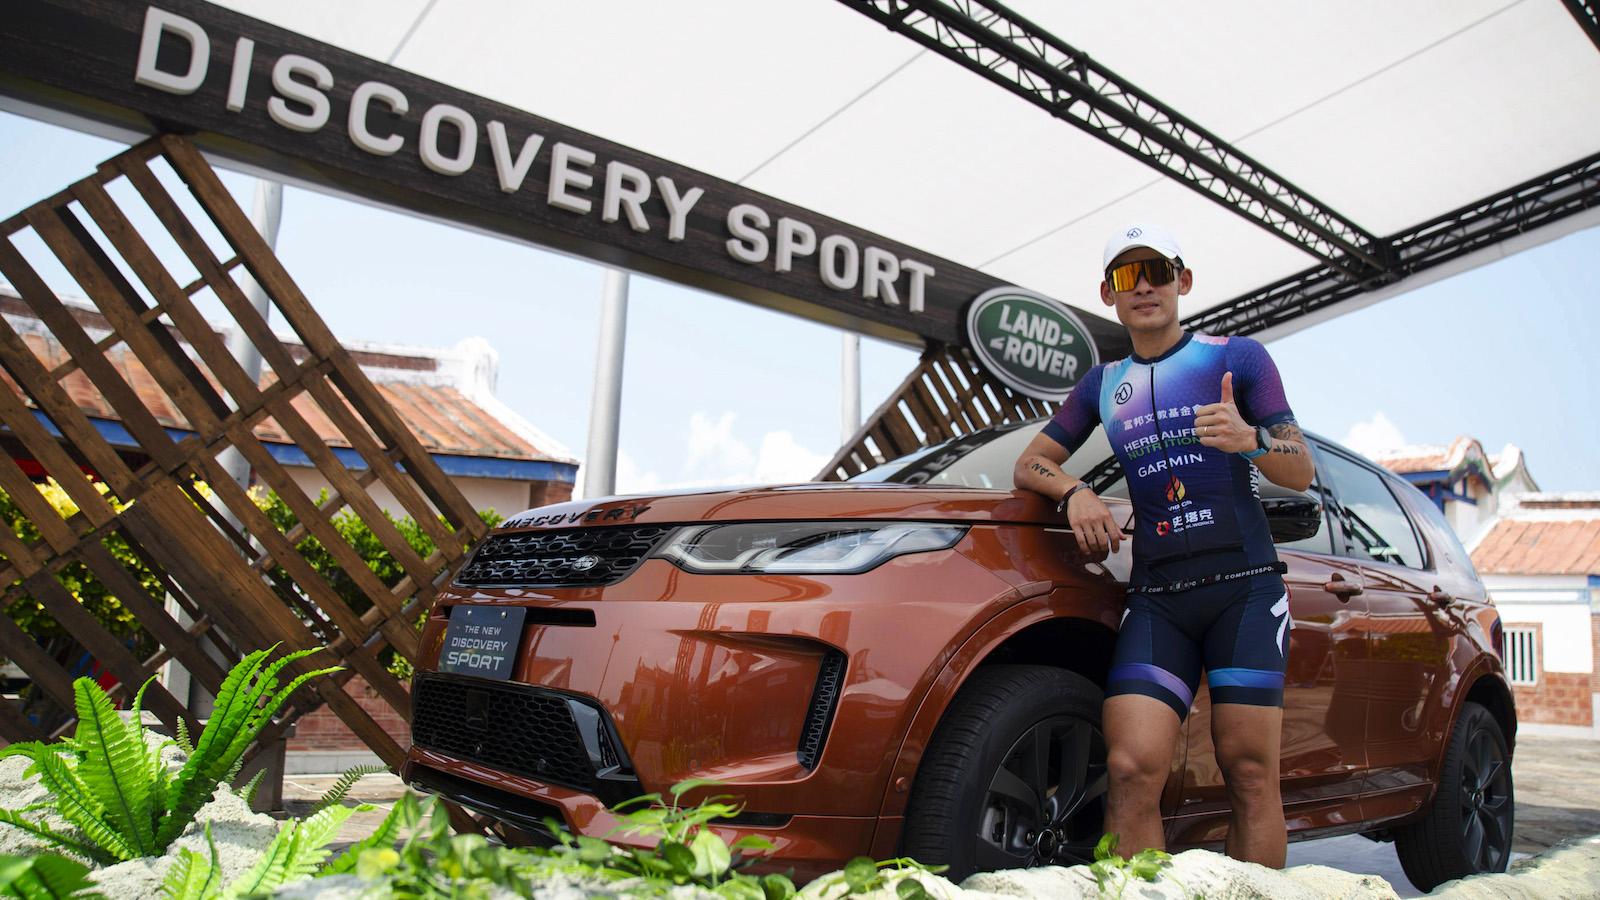 Land Rover Taiwan 前進南台灣 升級高雄品牌體驗、展現 Above and Beyond 精神